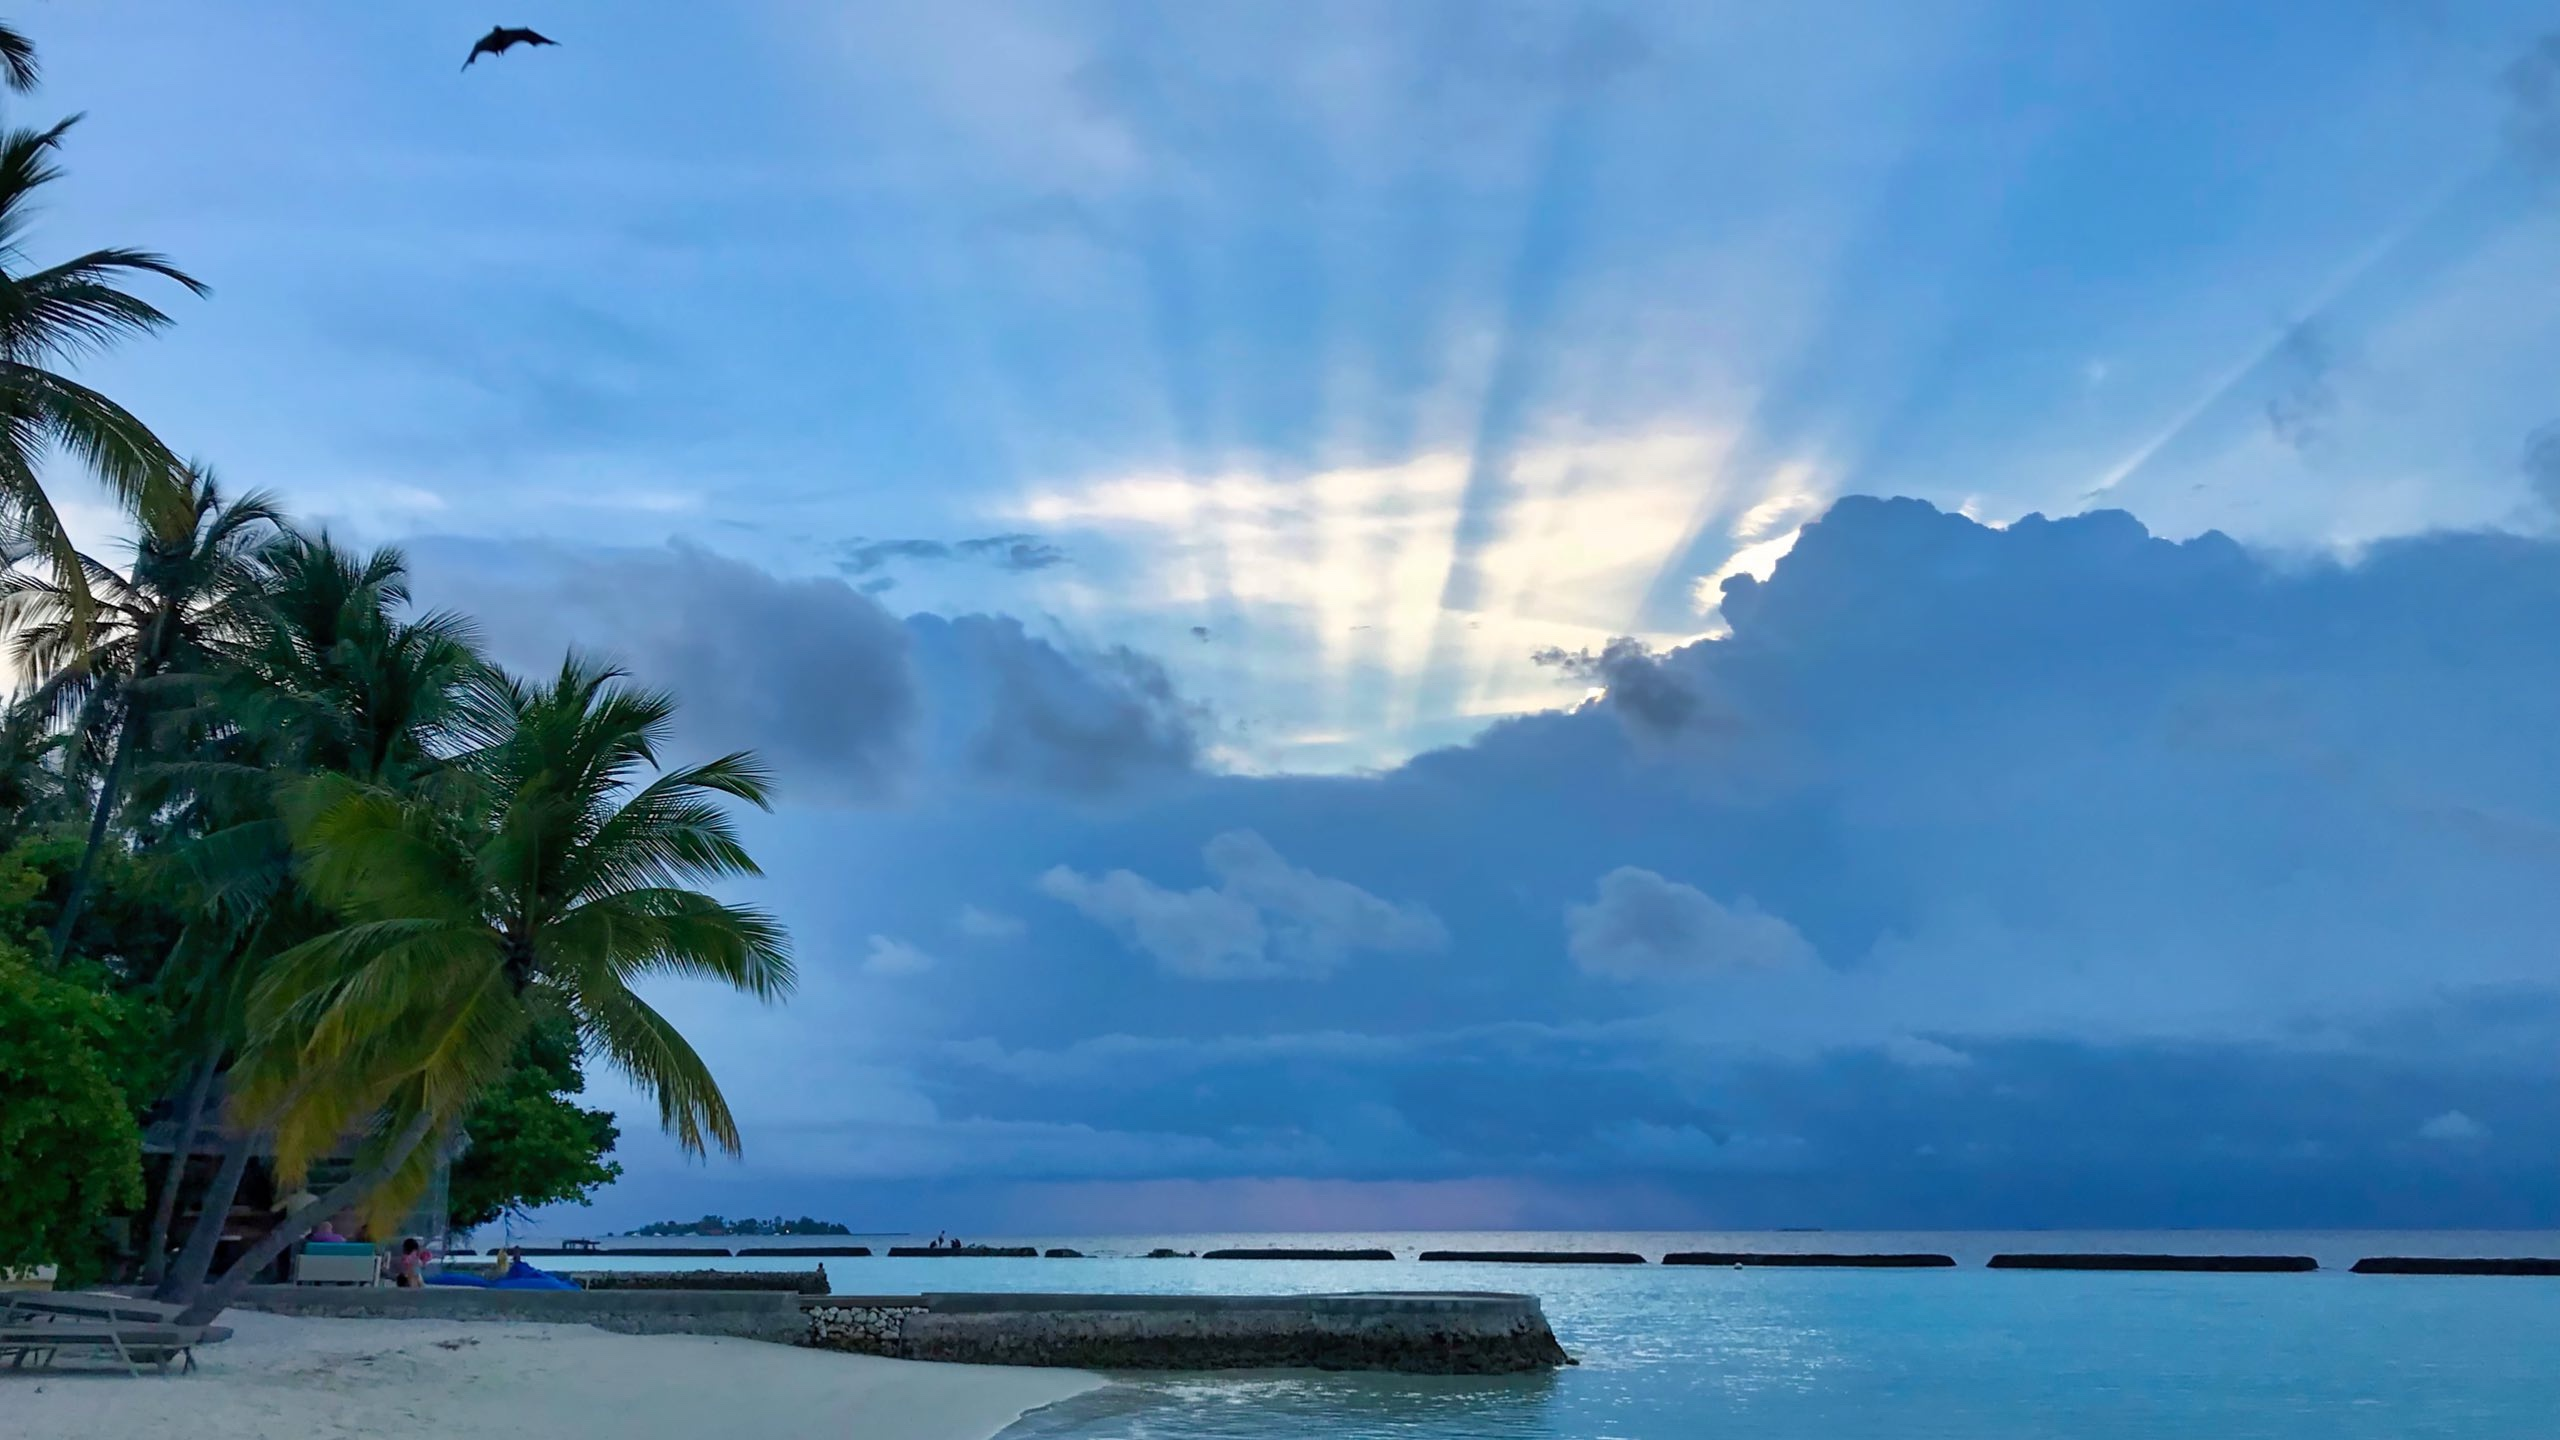 Der Sonnenuntergang, den Tag anders, jeden Tag wunderschön.